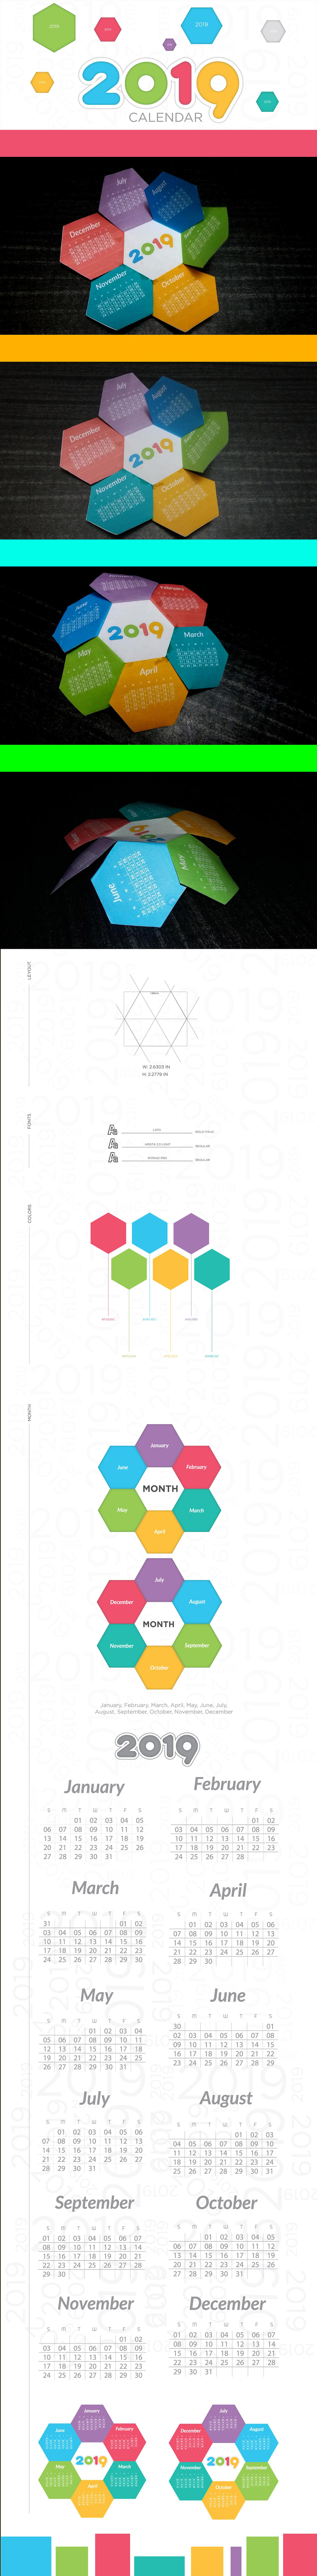 calendar design,calendar design 2019,design 2019,calendar 2019,calendar,A4 calendar,design,graphic calender,info graphic,info calendar